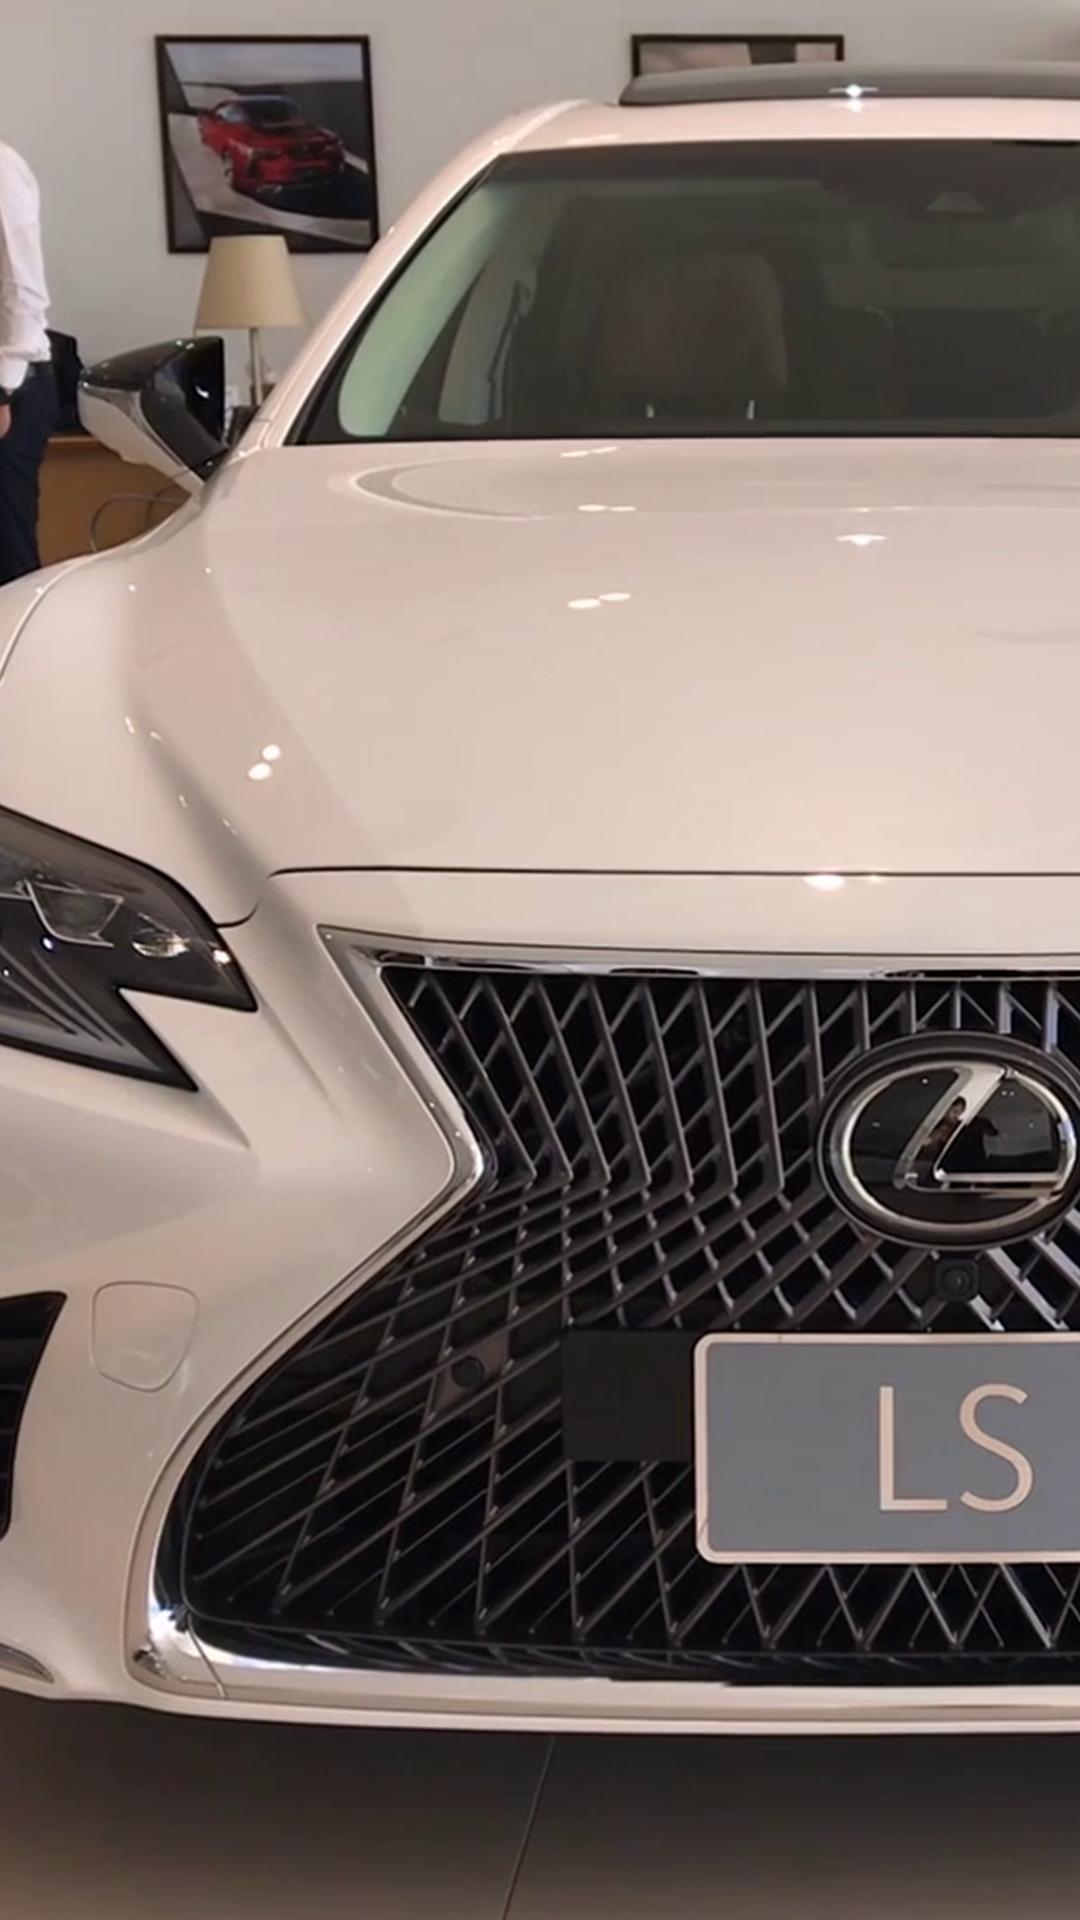 Lexus Ls 500 2020 1 80 Crore Real Life Review In 2020 Lexus Ls Lexus Luxury Sedan